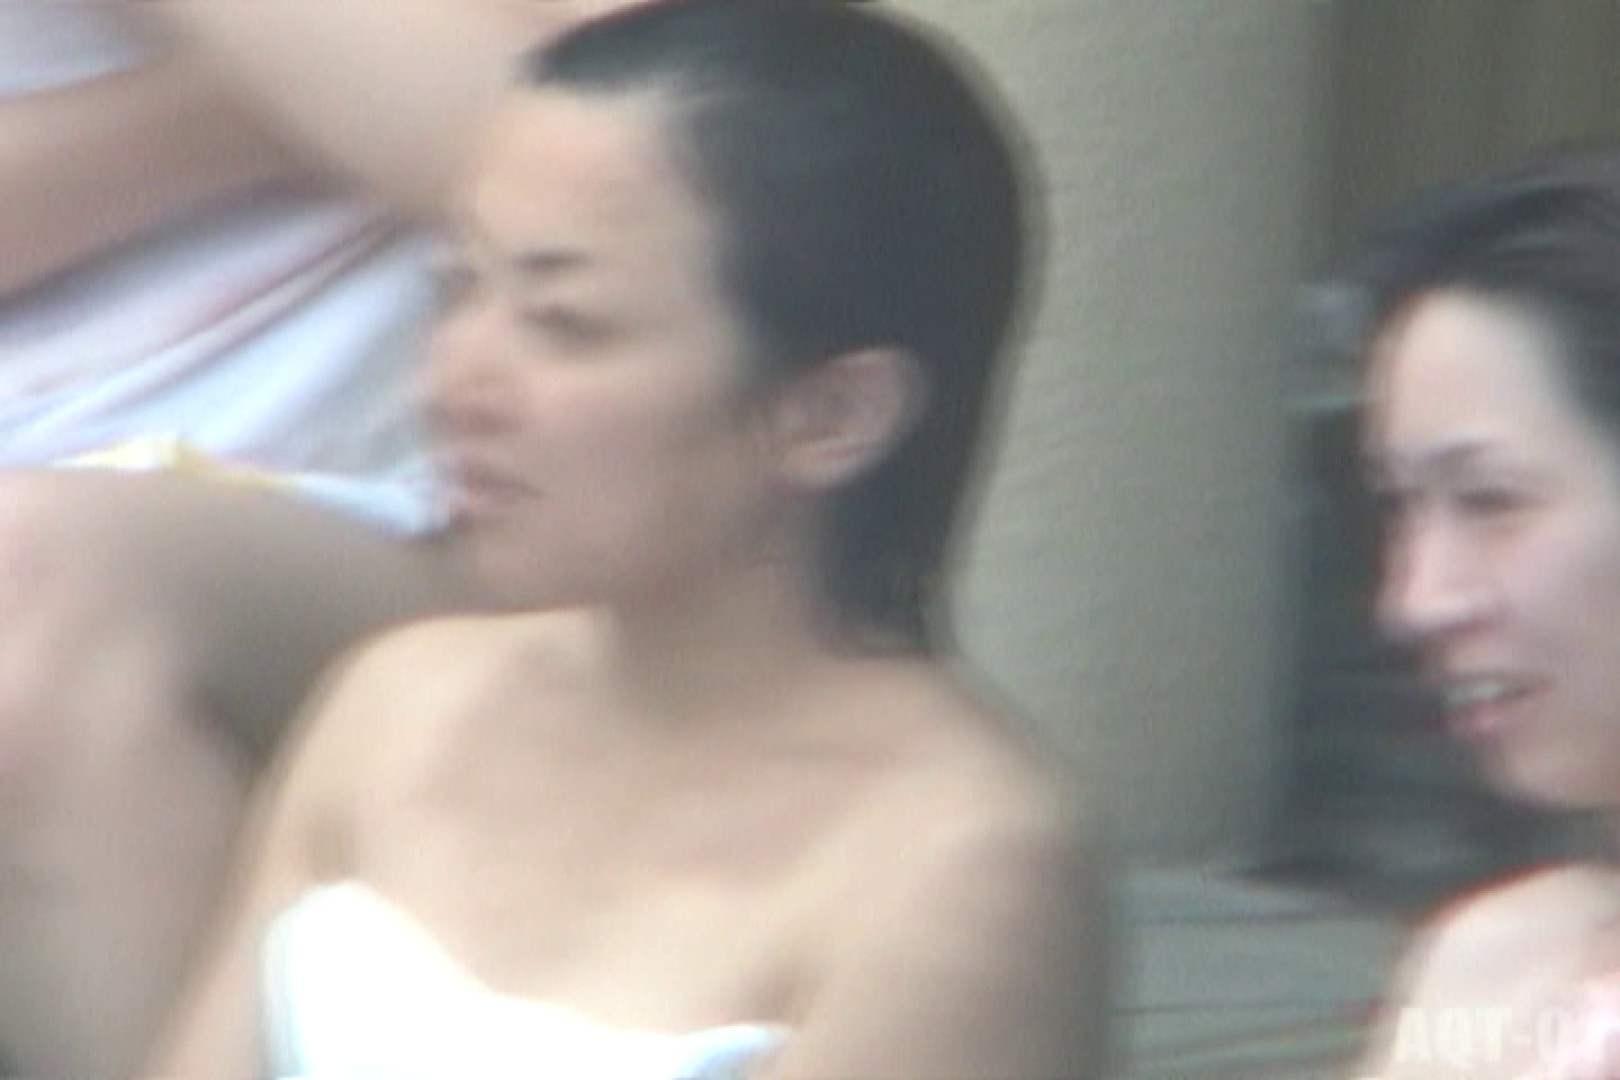 Aquaな露天風呂Vol.718 OLのエロ生活 | 露天風呂  44連発 25